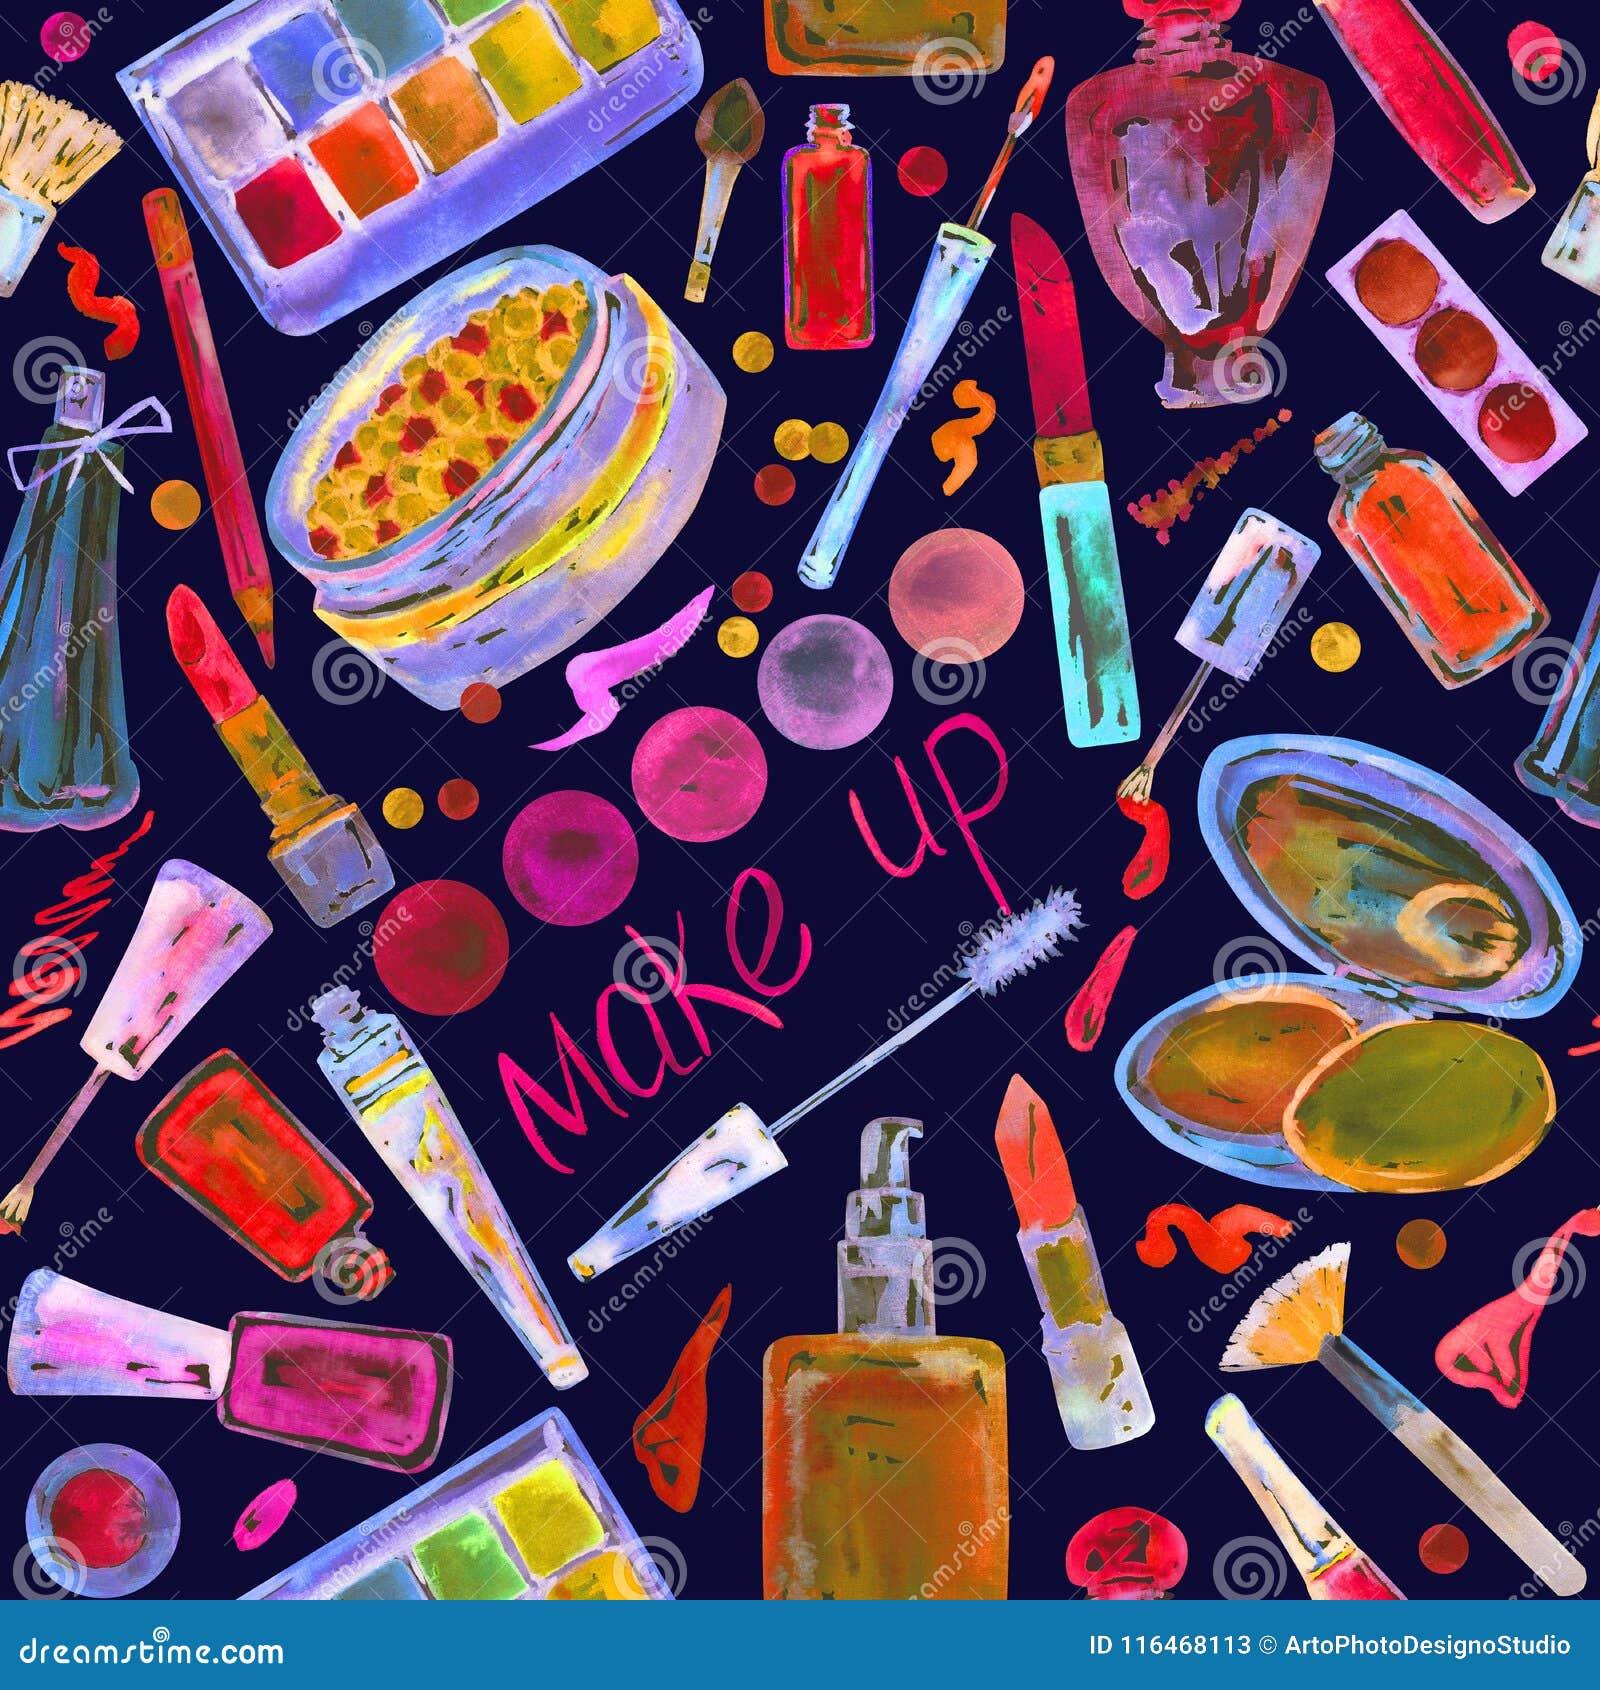 decorative cosmetics make up stuff collection in bright neon colors